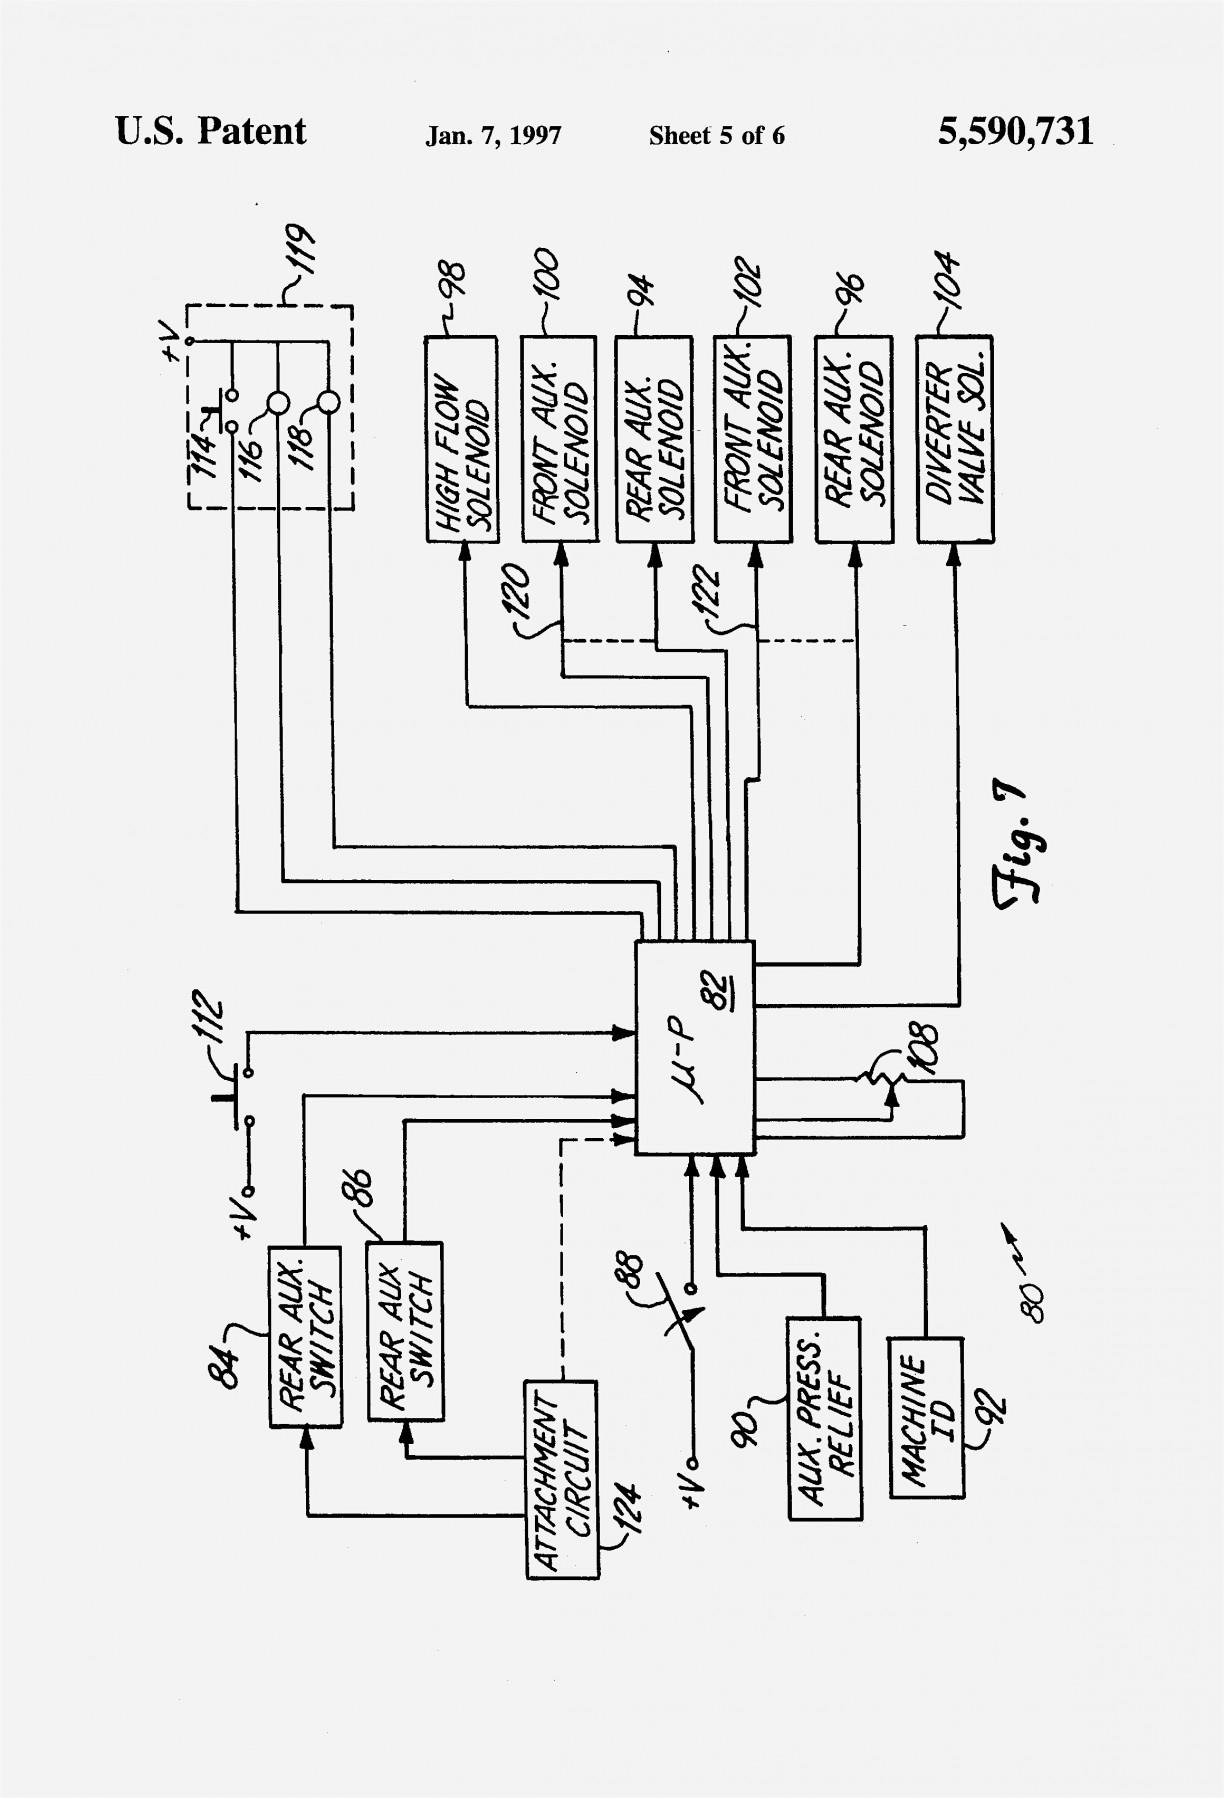 hawke dump trailer wiring diagram Download-bri mar dump trailer wiring diagram Download Dump Trailer Wiring Diagram Beautiful Dump Trailer Wiring 15-t